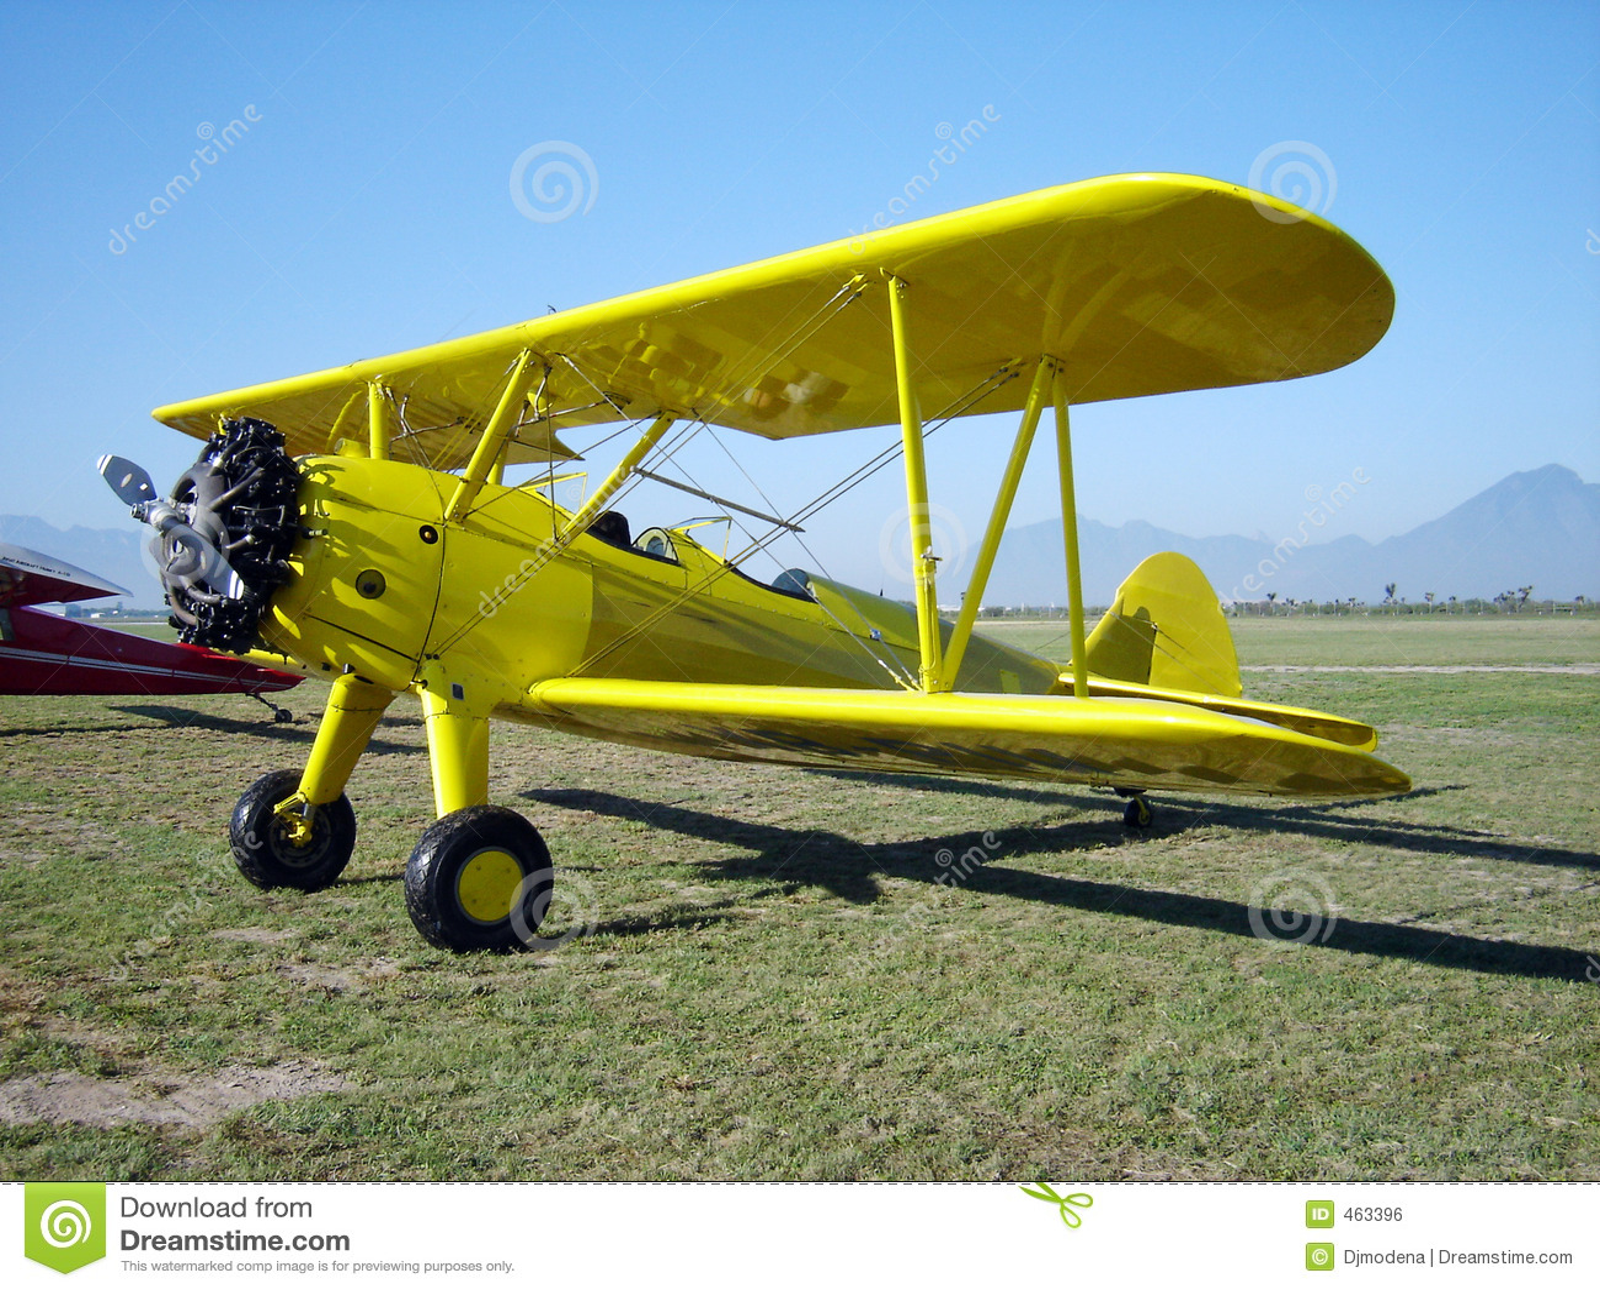 Yellow biplane Aircraft